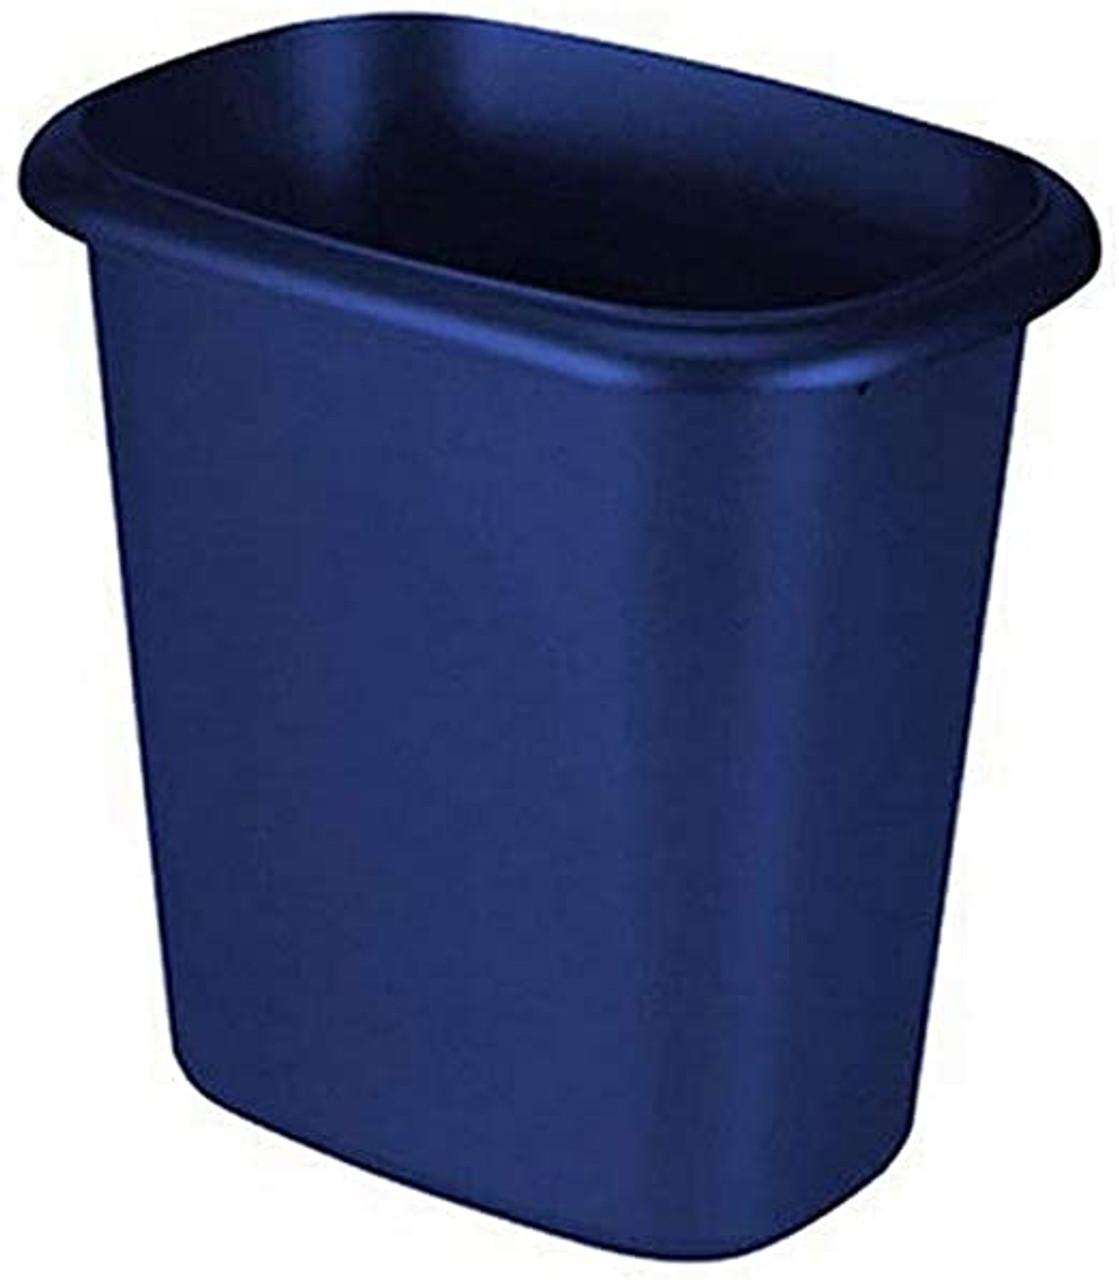 6 Quart Royal Blue Vanity Bathroom Wastebasket 2953